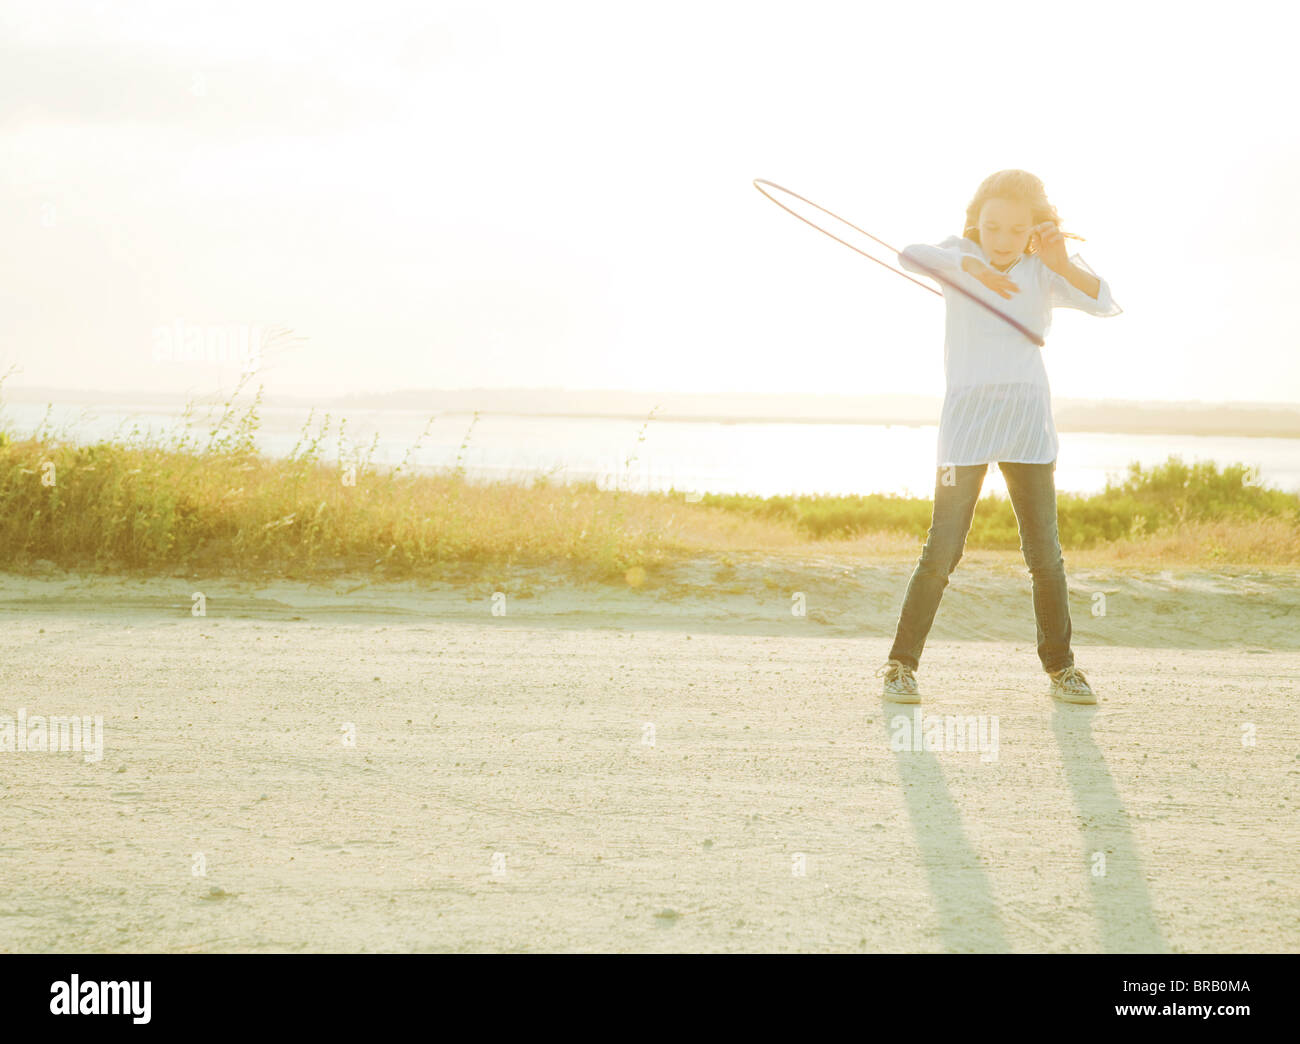 Girl playing with a hula hoop - Stock Image